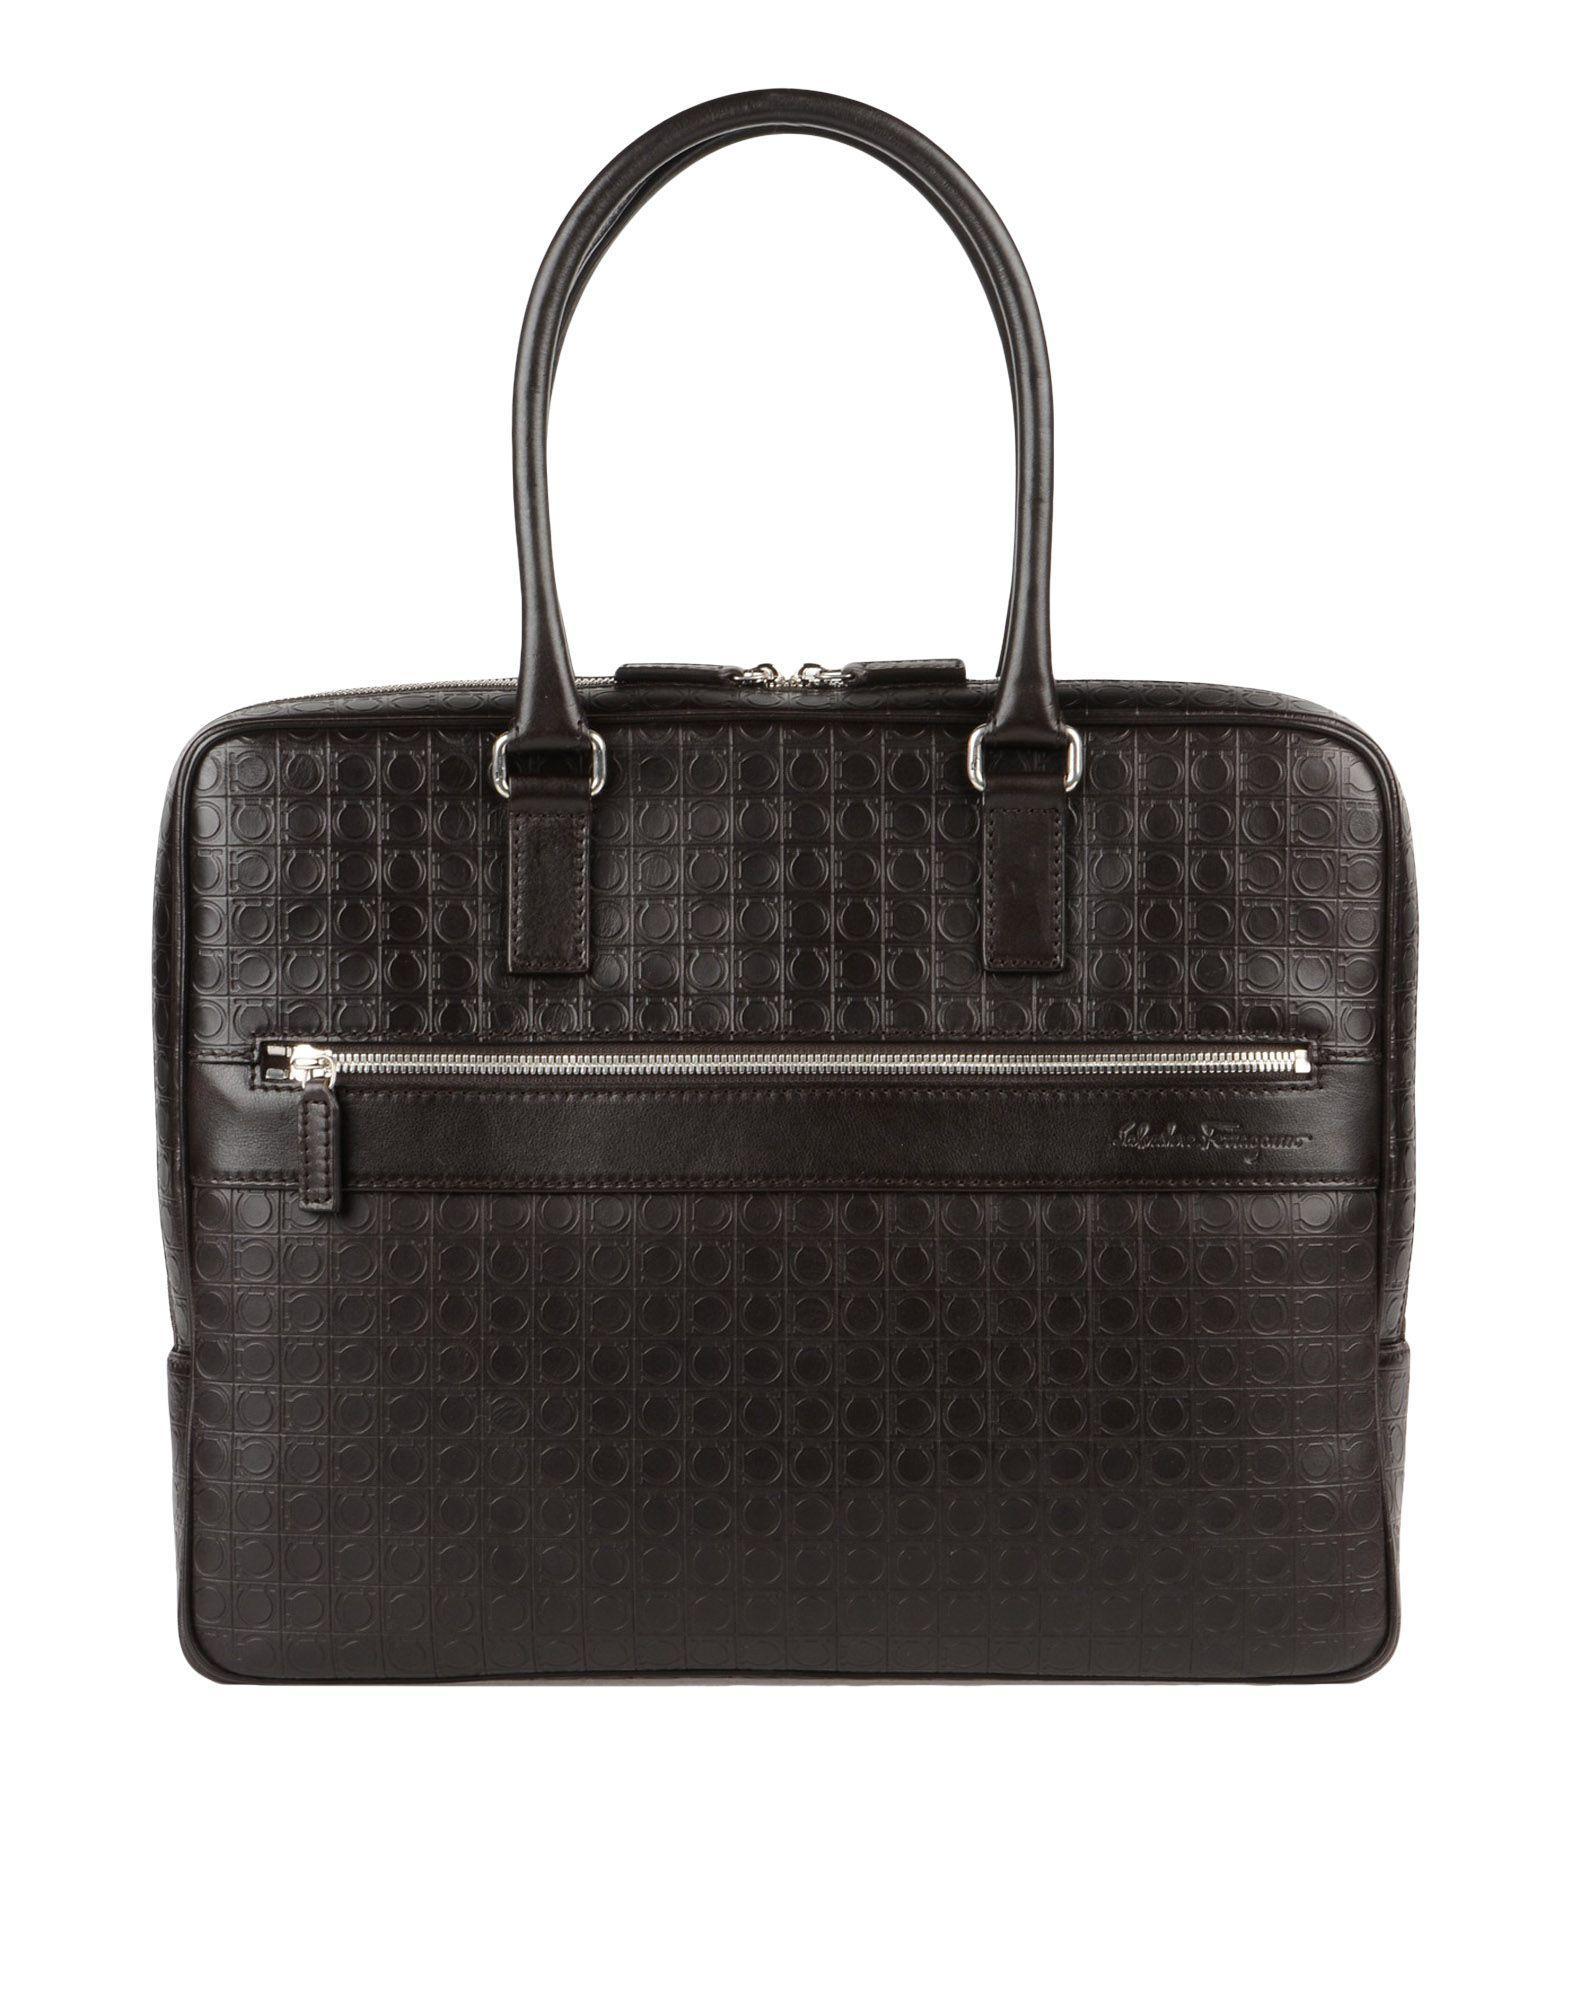 Salvatore Ferragamo Work Bags In Dark Brown